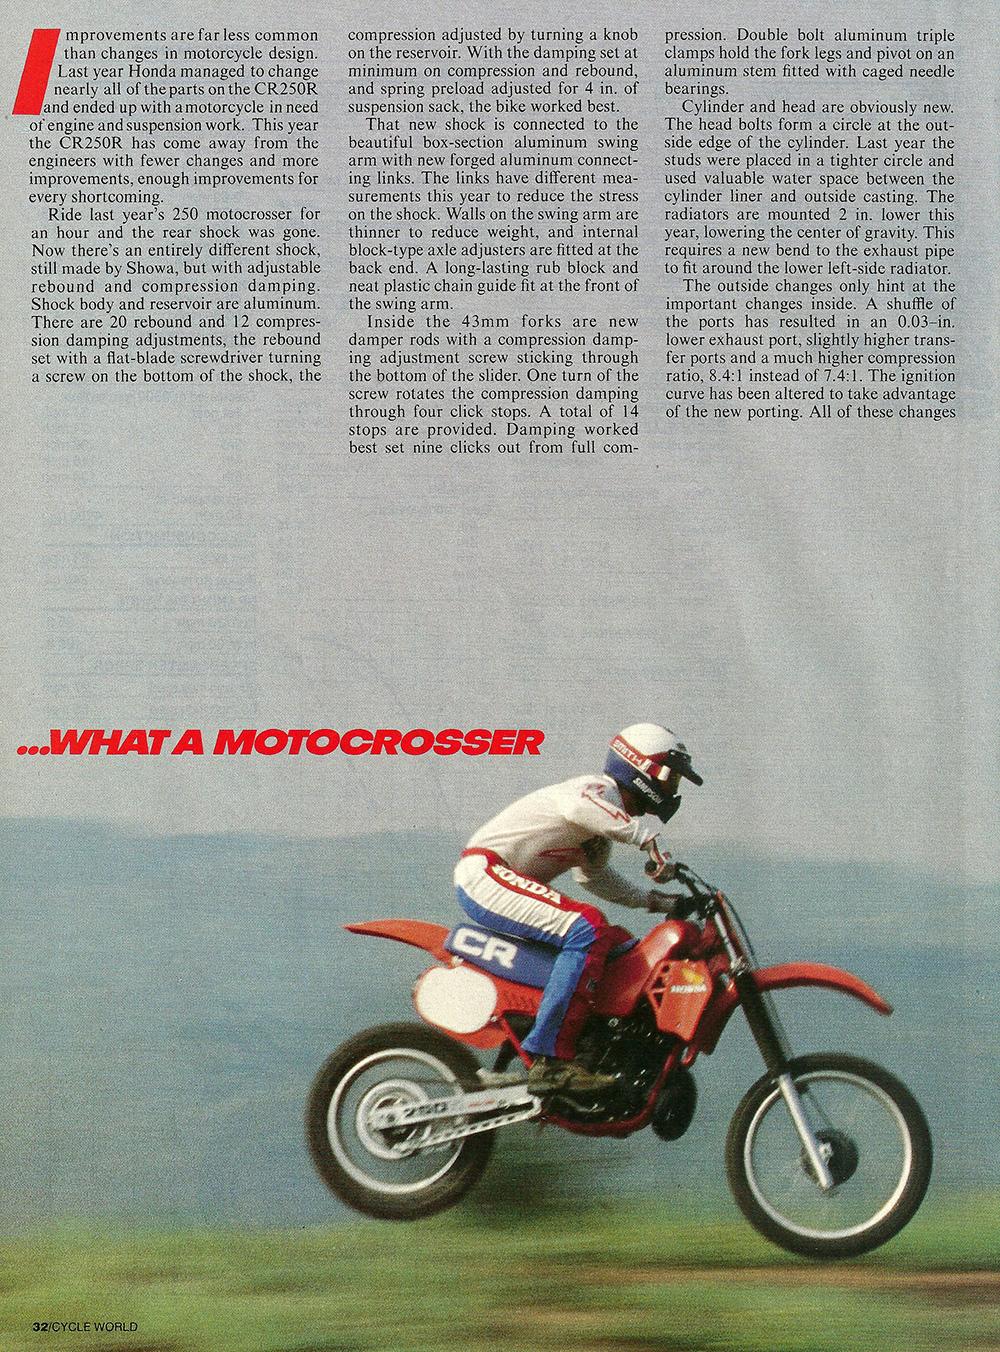 1983 Honda CR250R road test 01.jpg